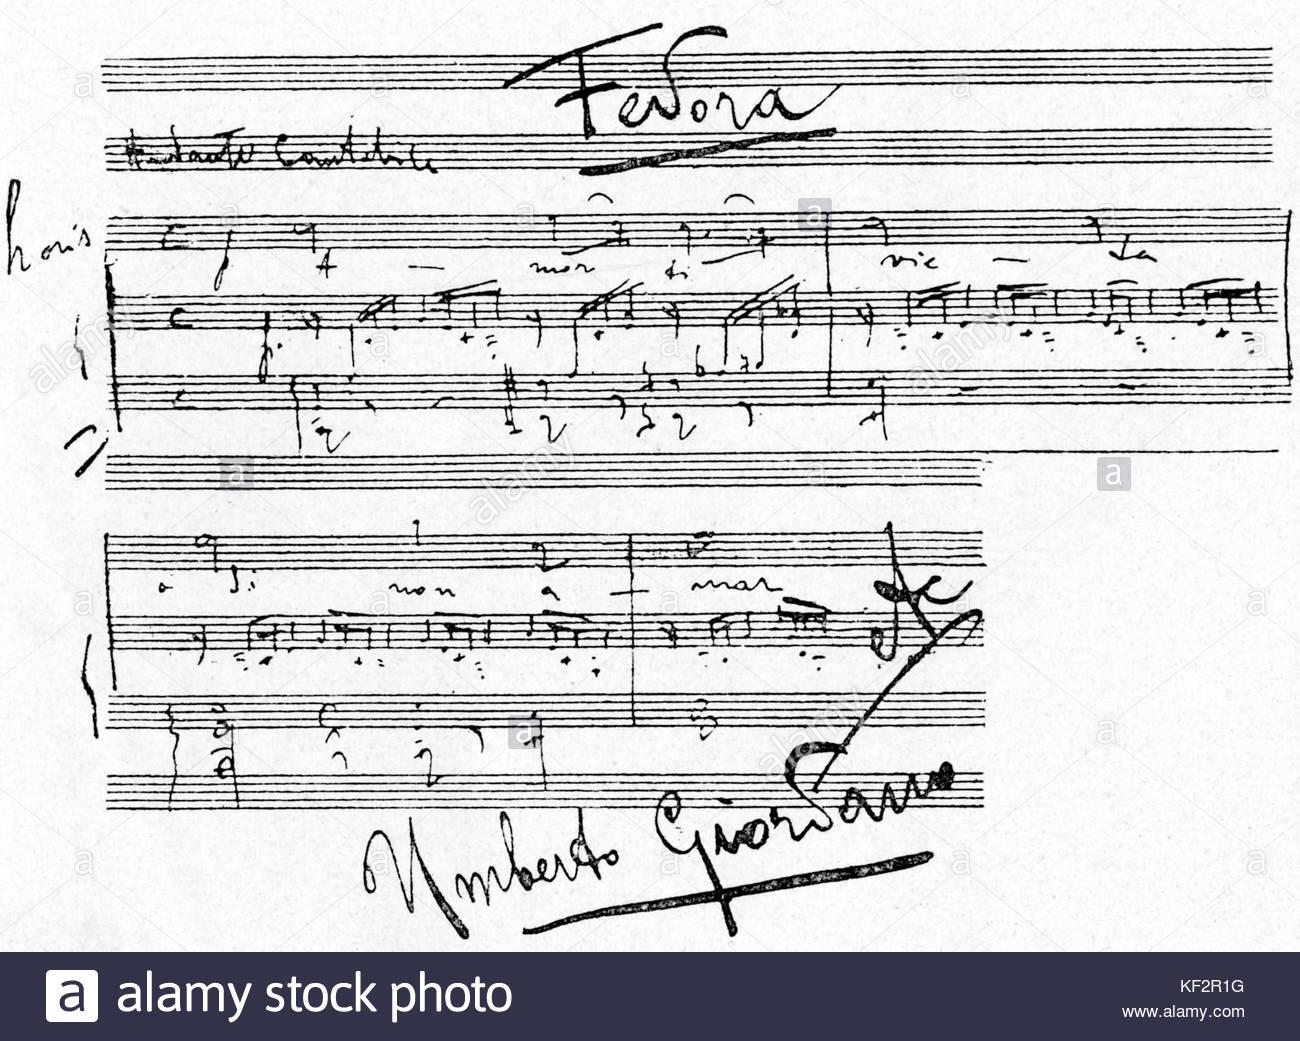 Fedora manuscript